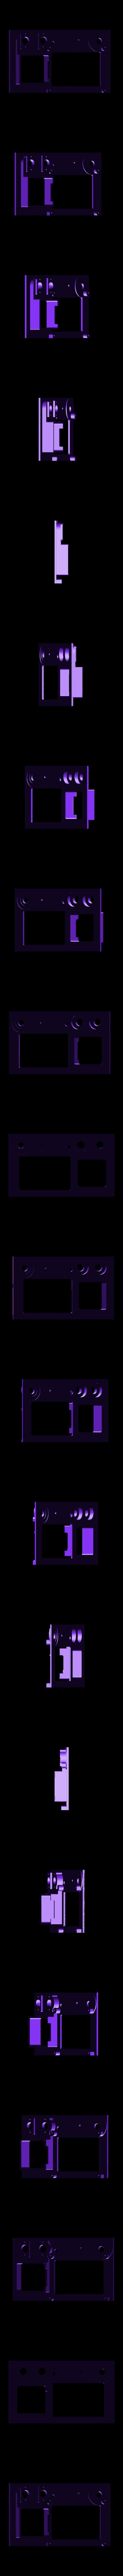 full_graphic_smart_controller_panel.stl Download free STL file Portable 3D Printer • 3D printable design, Job